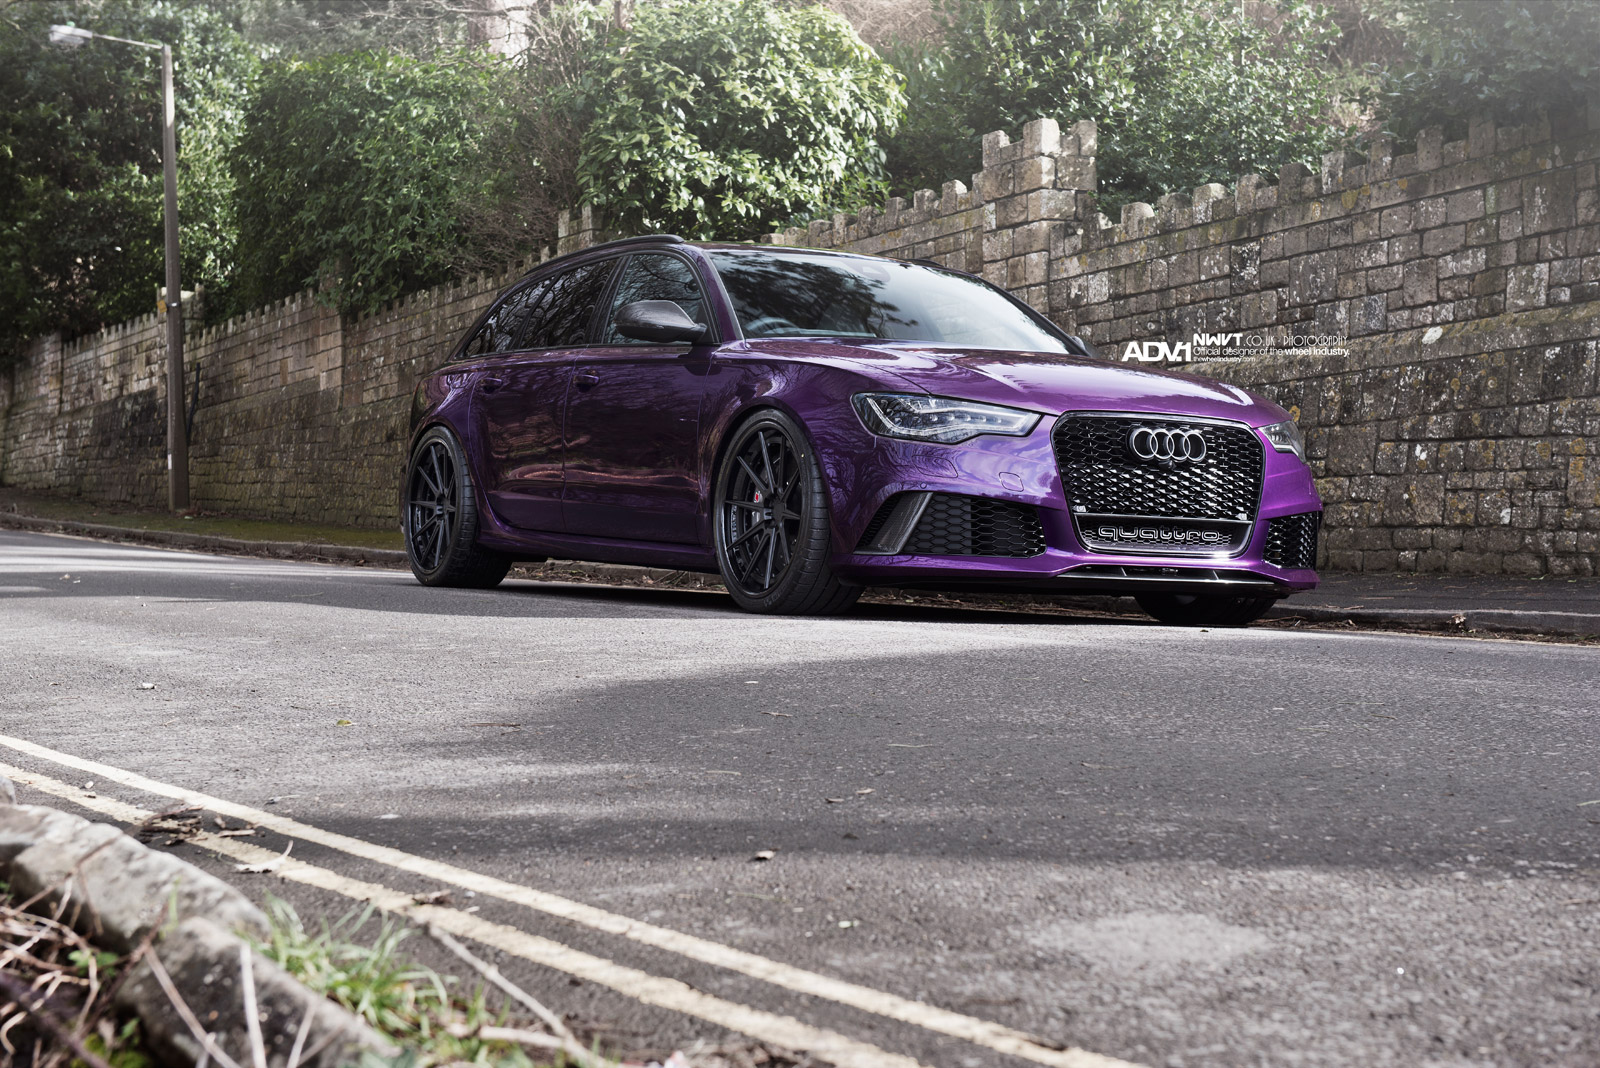 Bmw Cars Wallpapers Hd 2014 Purple Sled Audi Rs6 Avant On Adv 1 Wheels Autoevolution